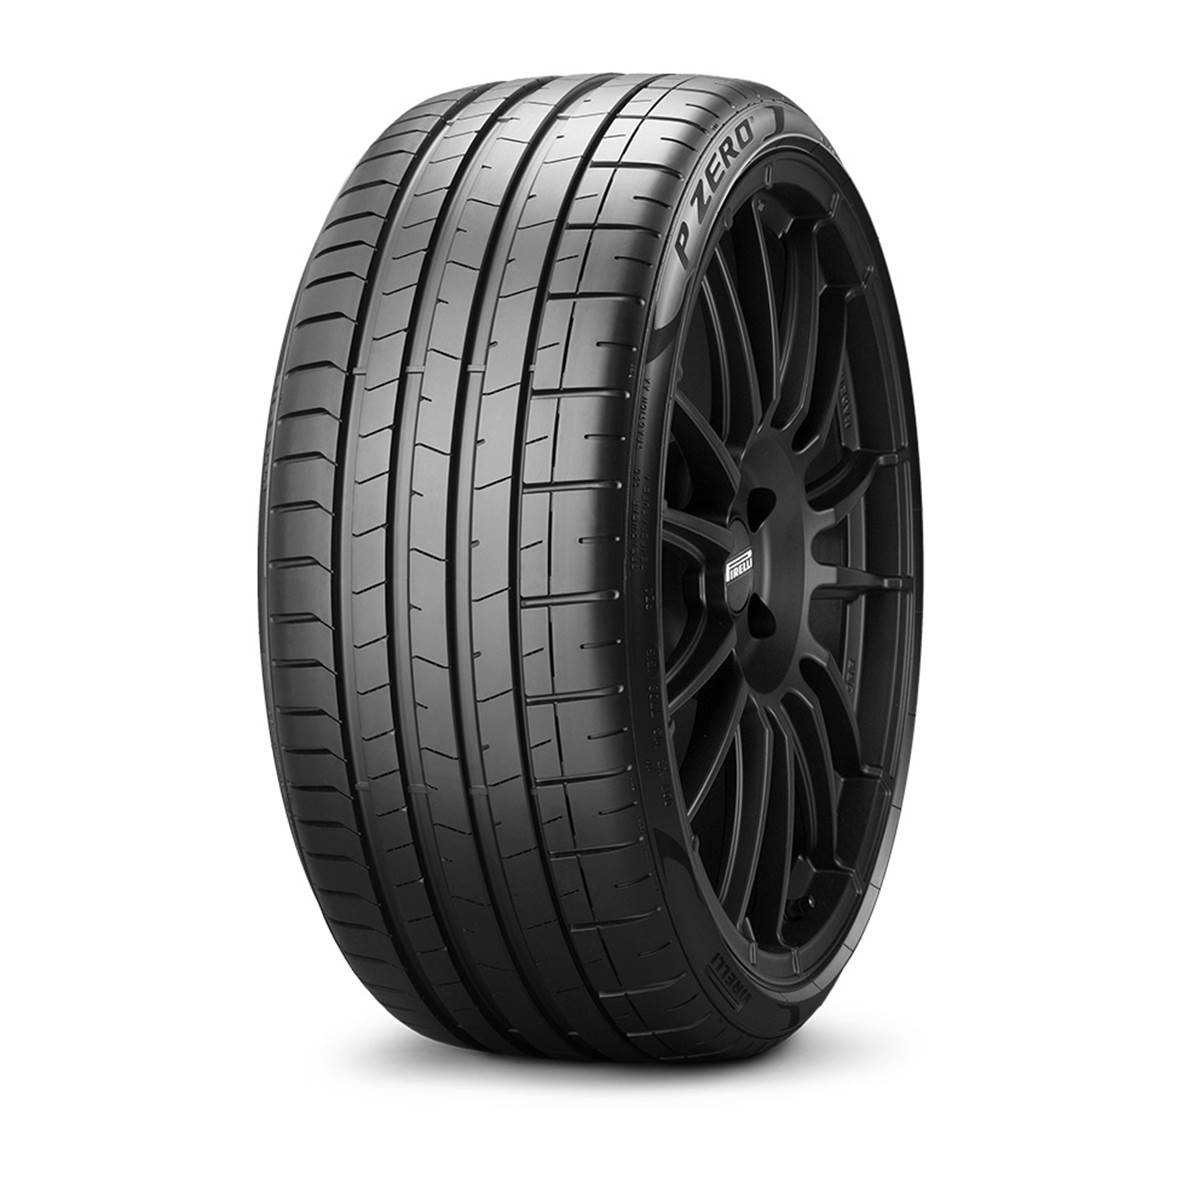 Pneu Pirelli 235/40R18 95W P-Zero XL